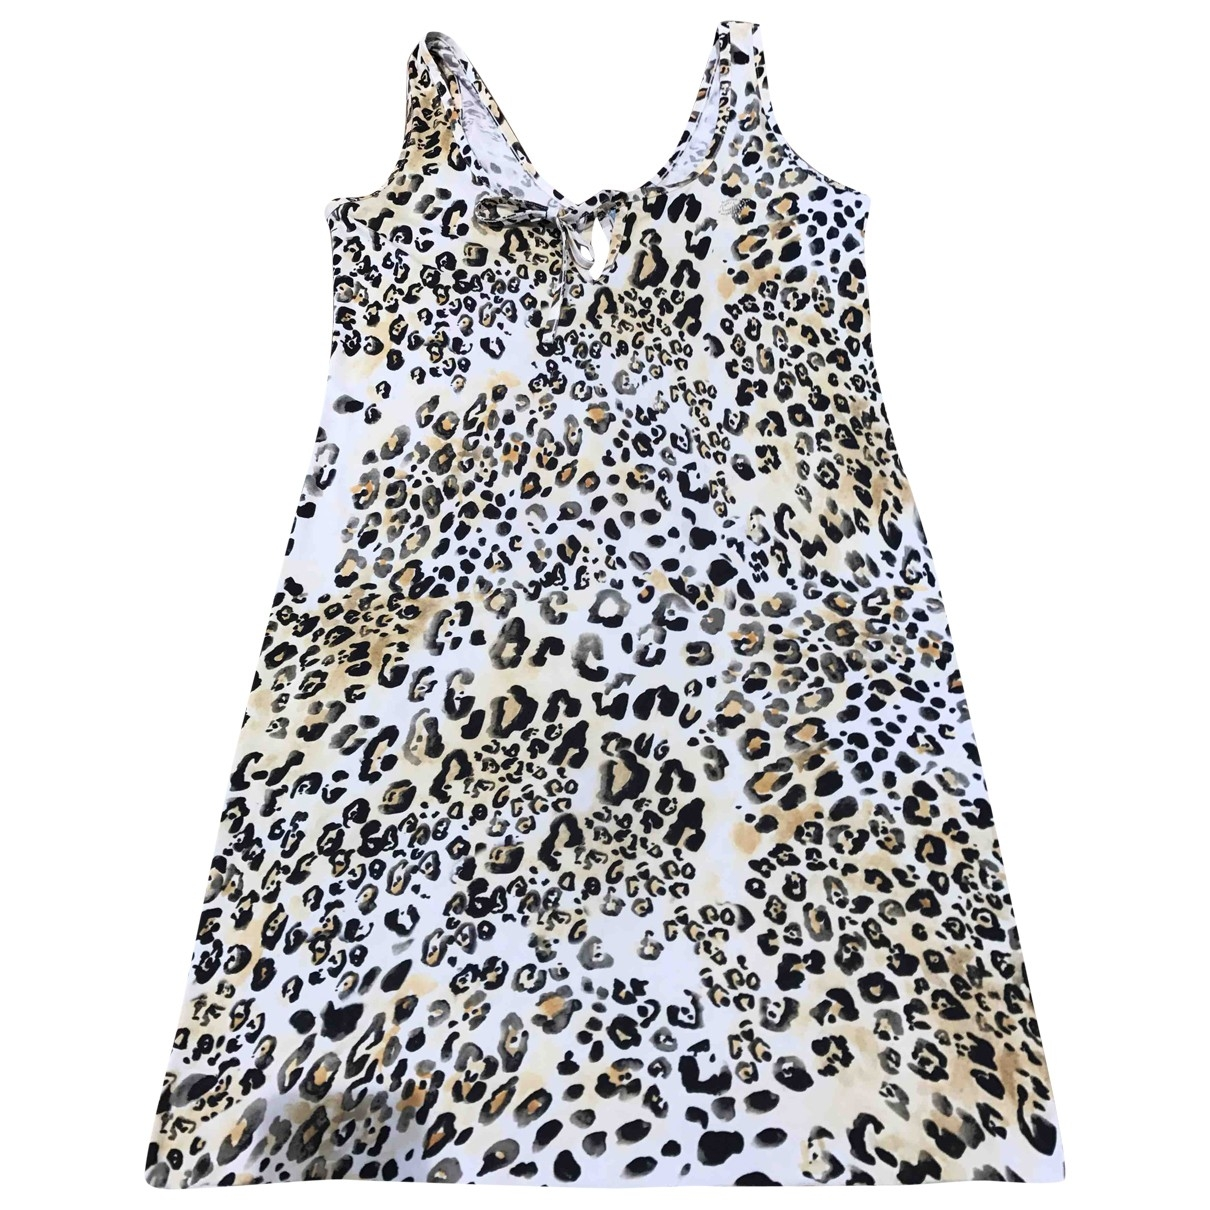 Blumarine \N Ecru dress for Women M International